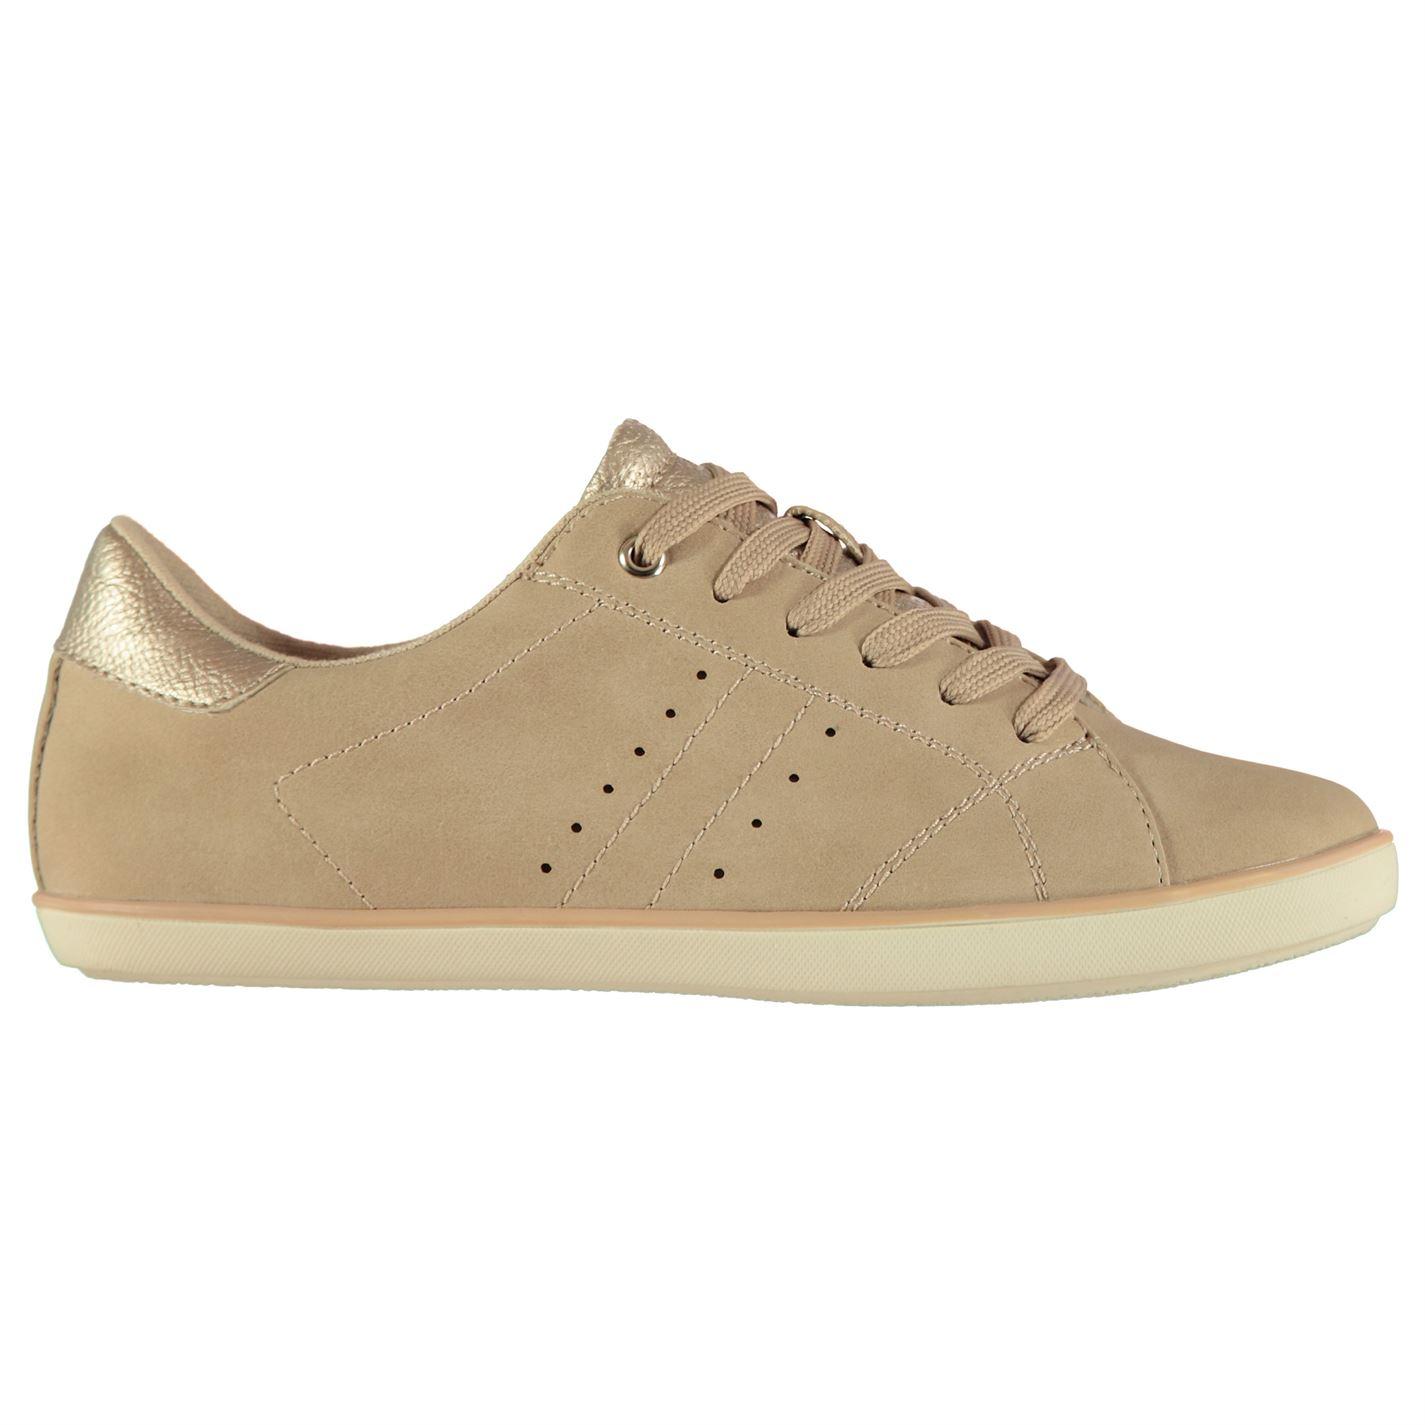 Kangol Ada Low Ladies Trainers   Casual Footwear for Women